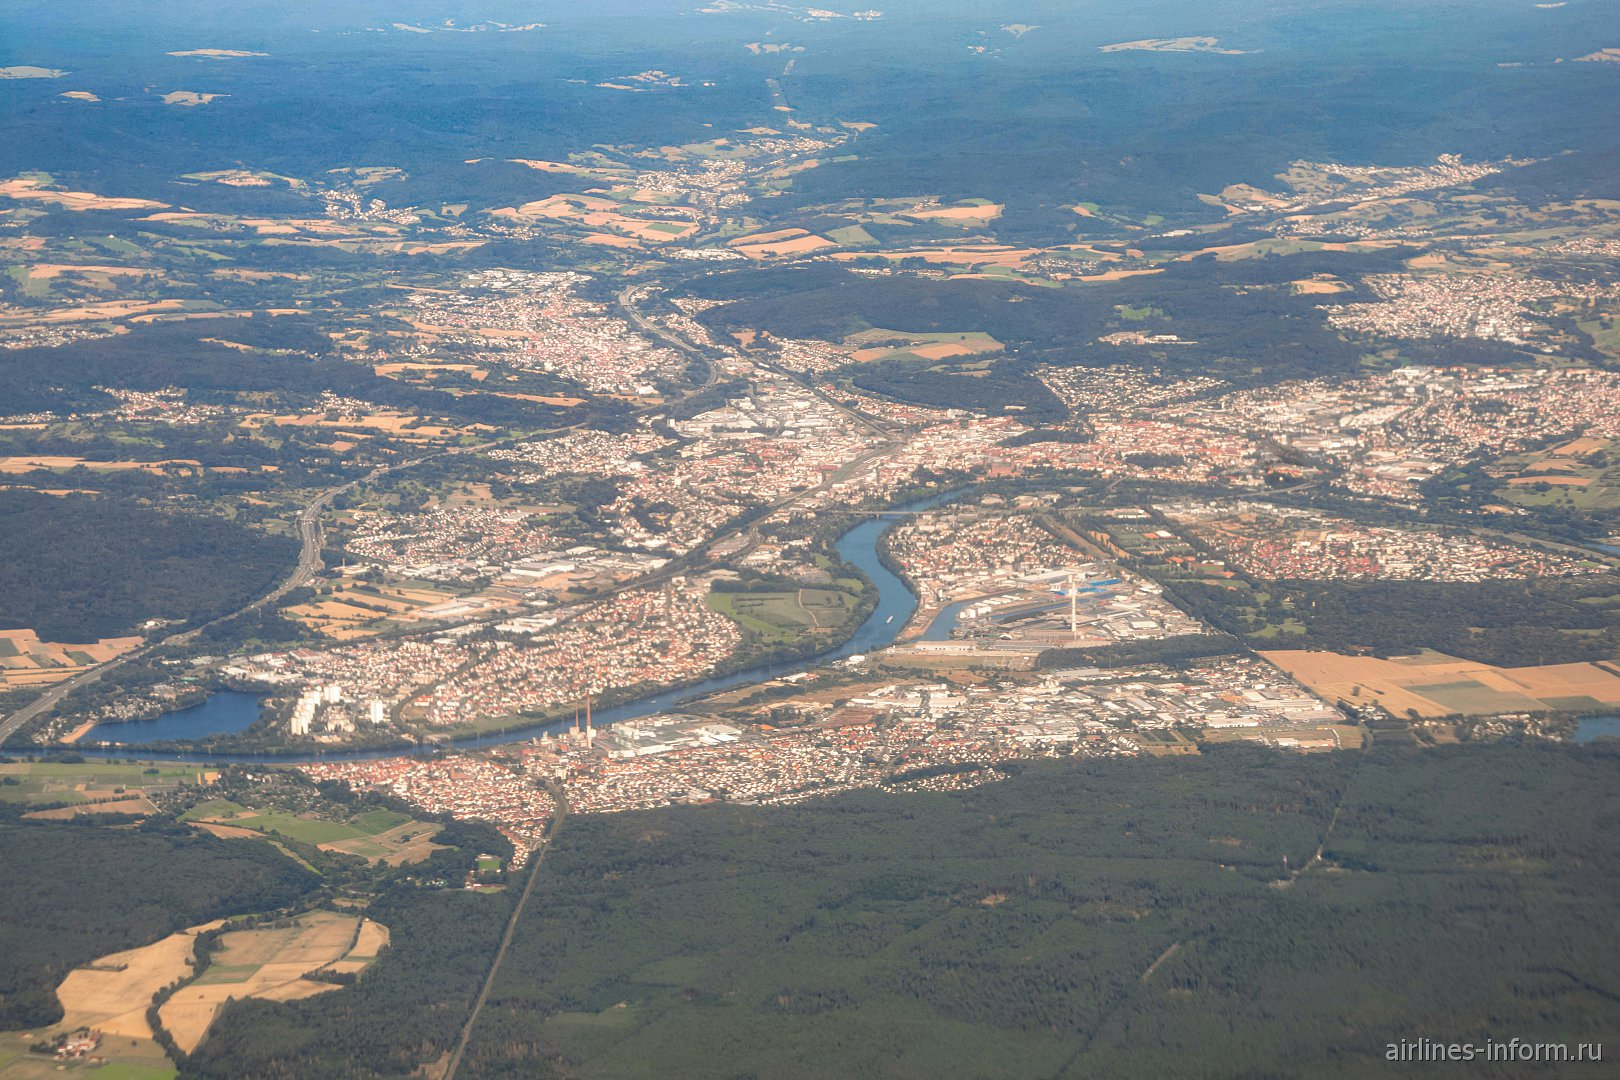 Вид сверху на город Ашаффенбург на реке Майн